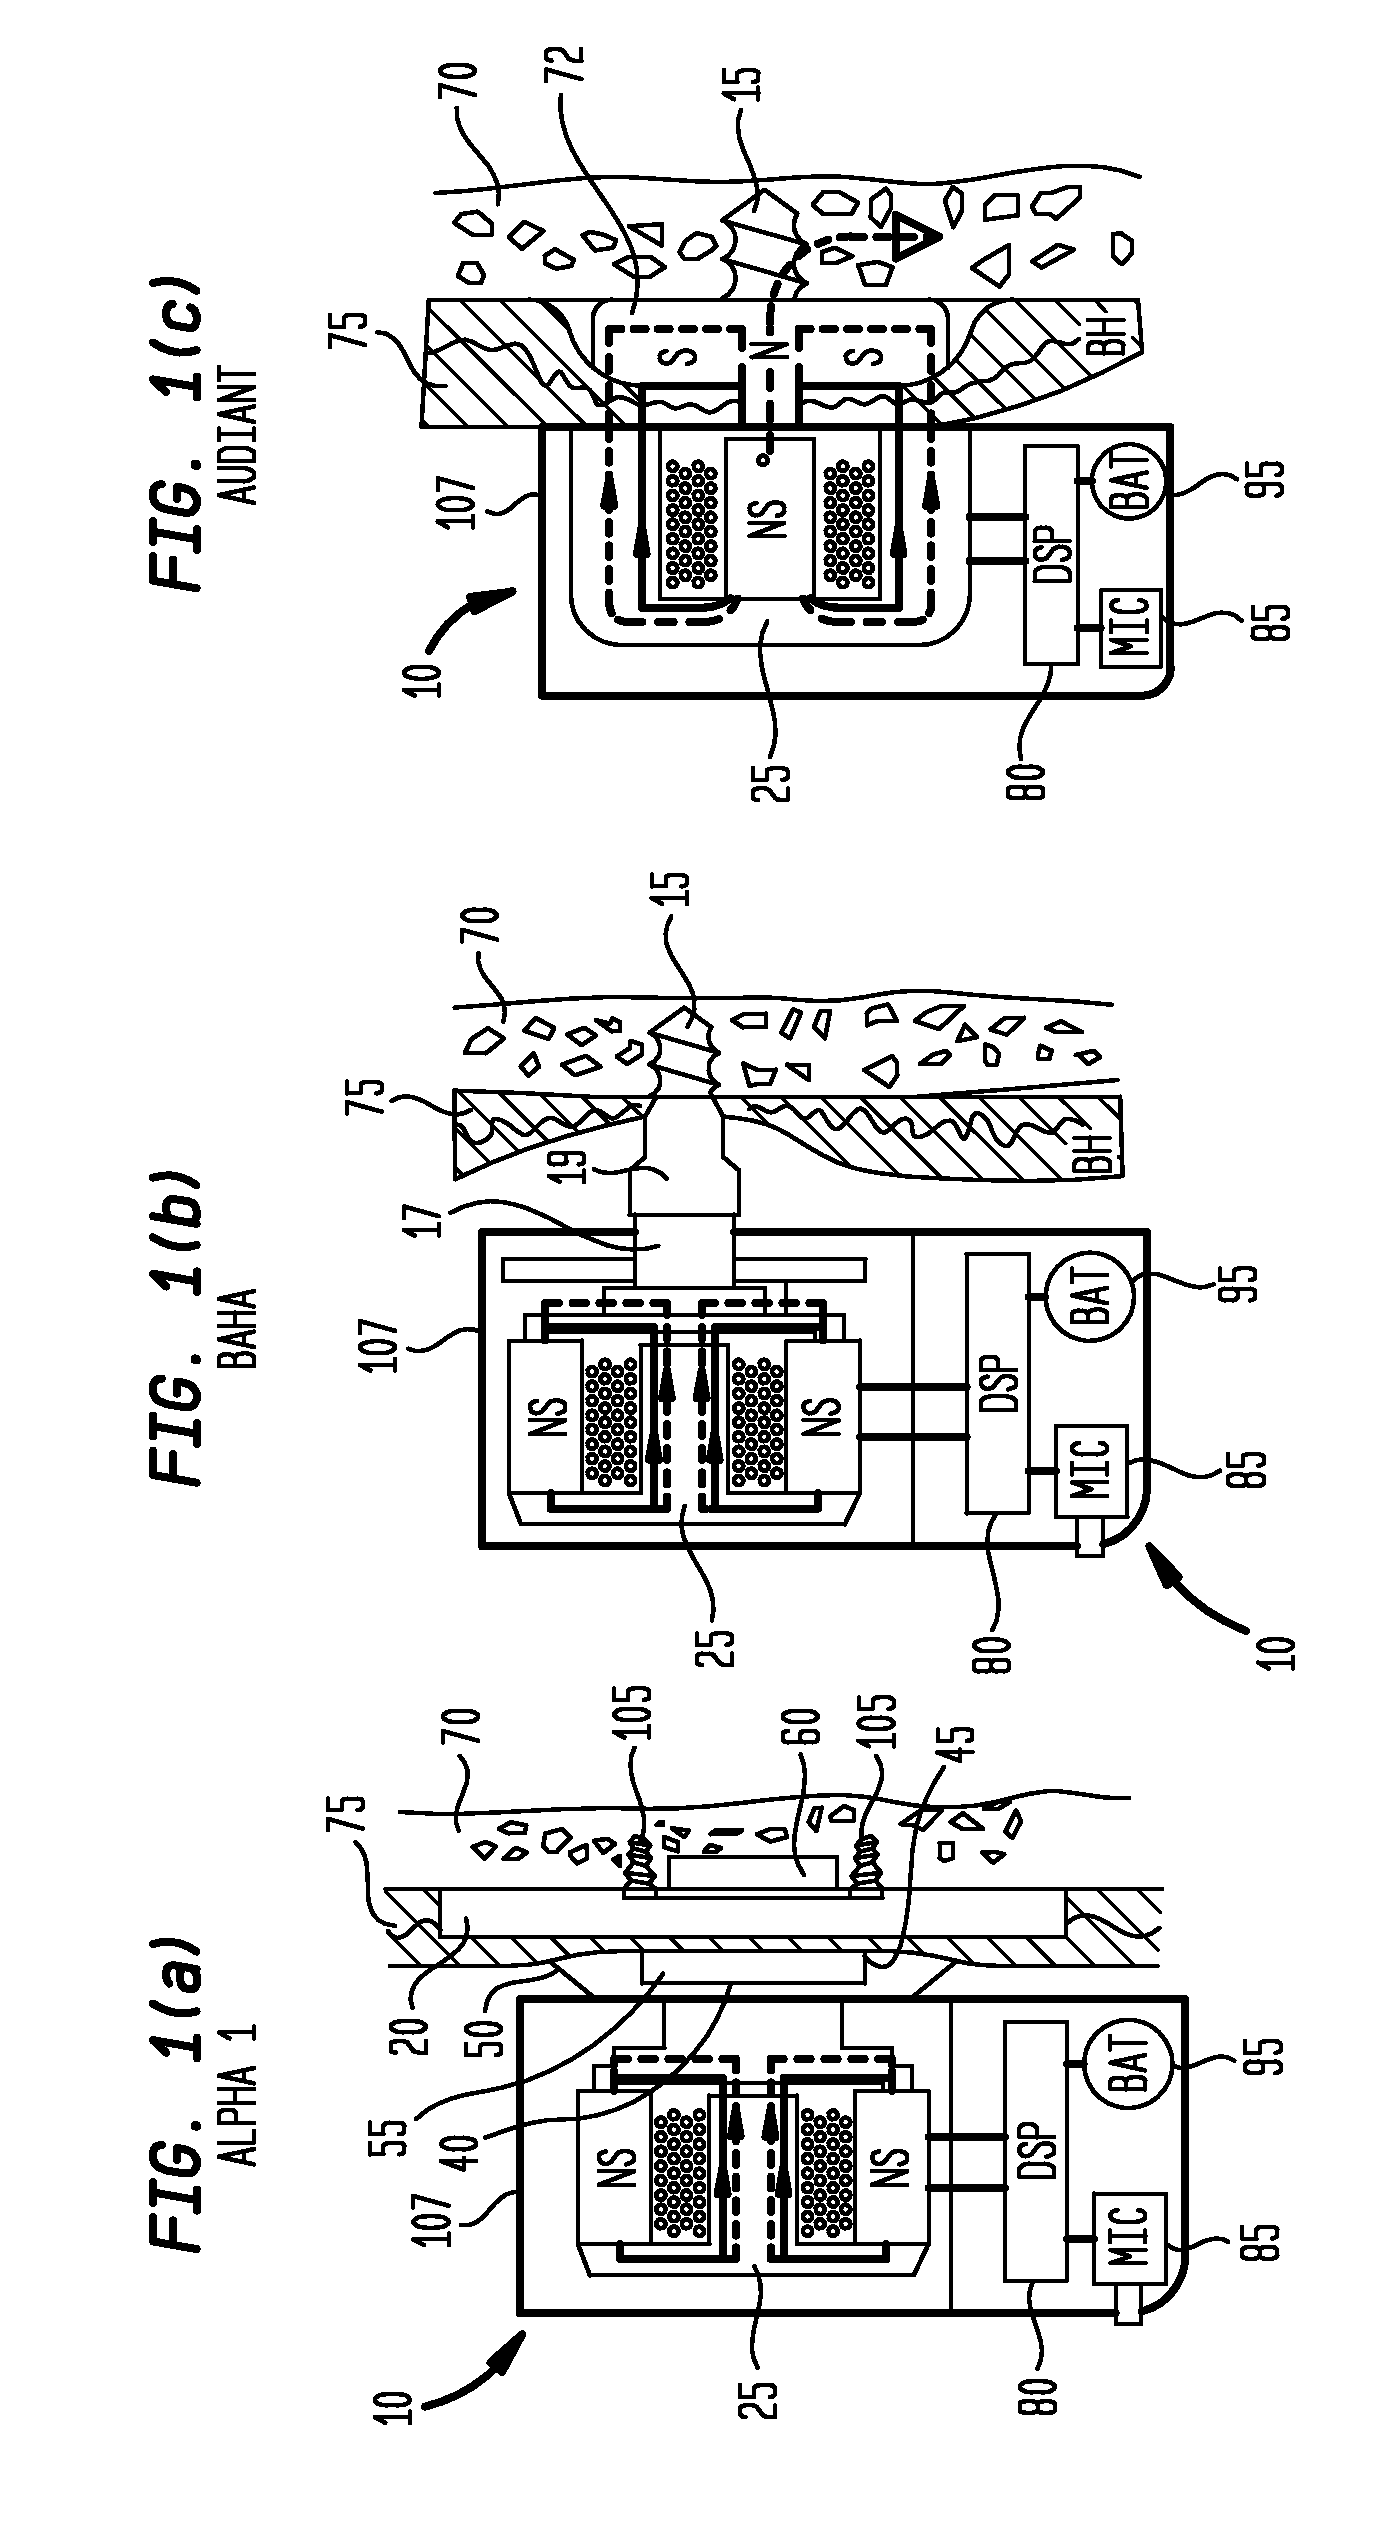 hearing aid wiring diagram hearing aid parts breakdown